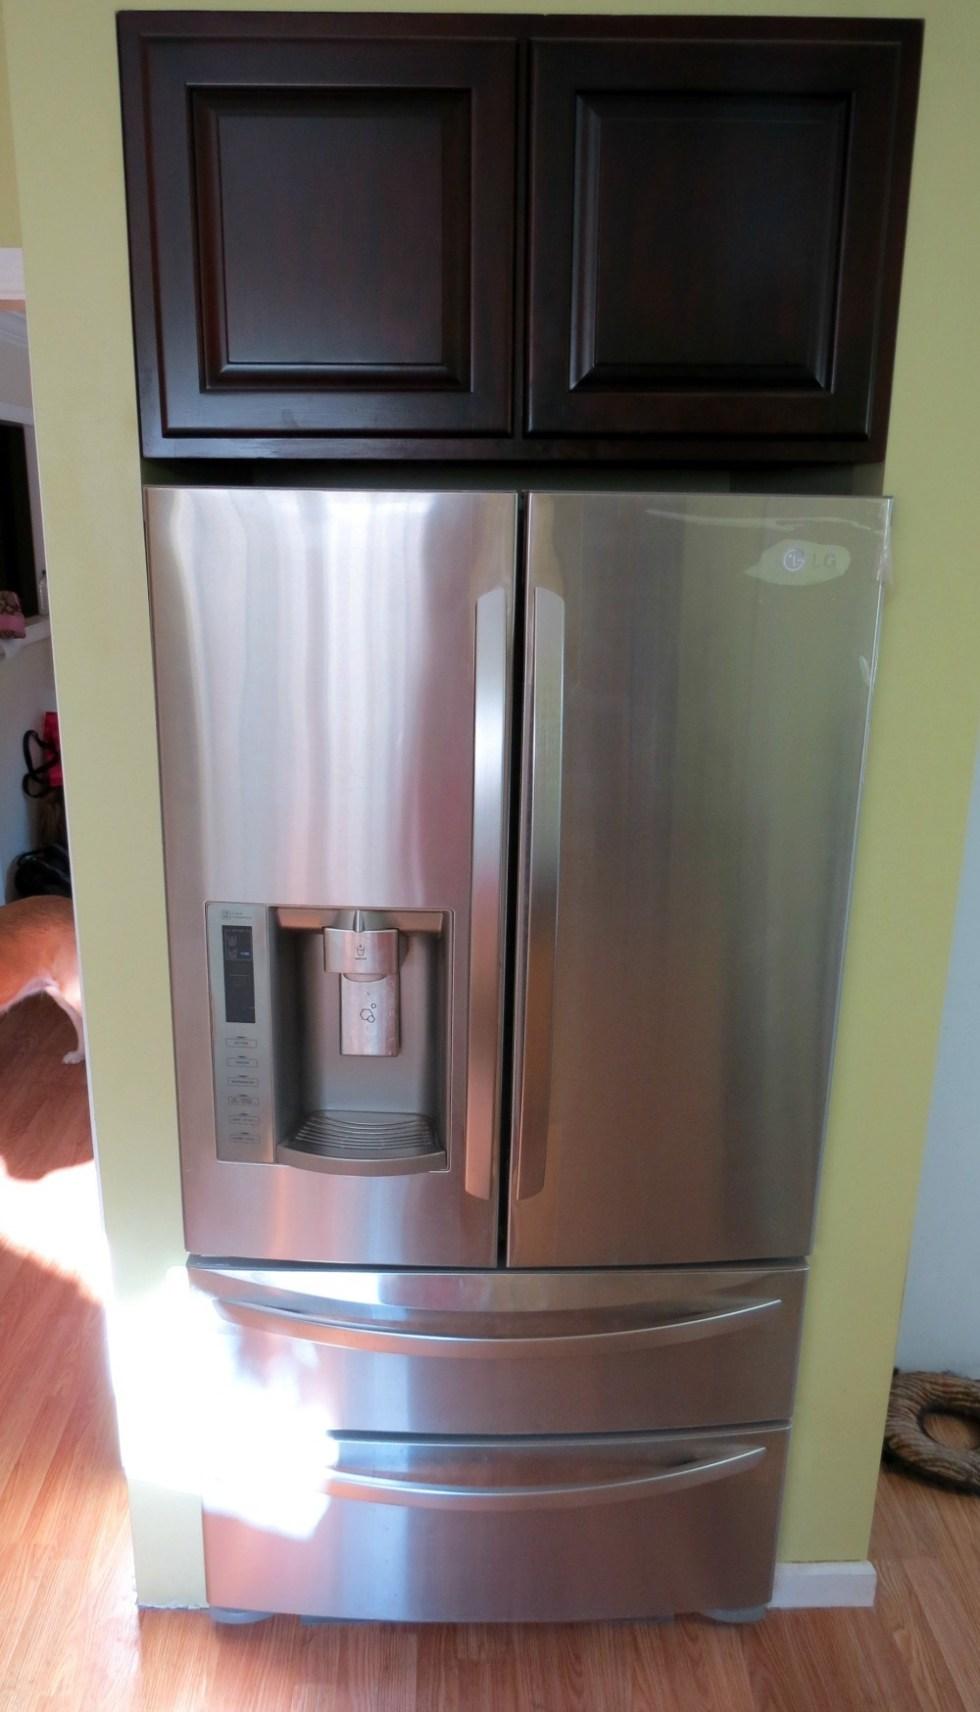 Refridgerator Makeover